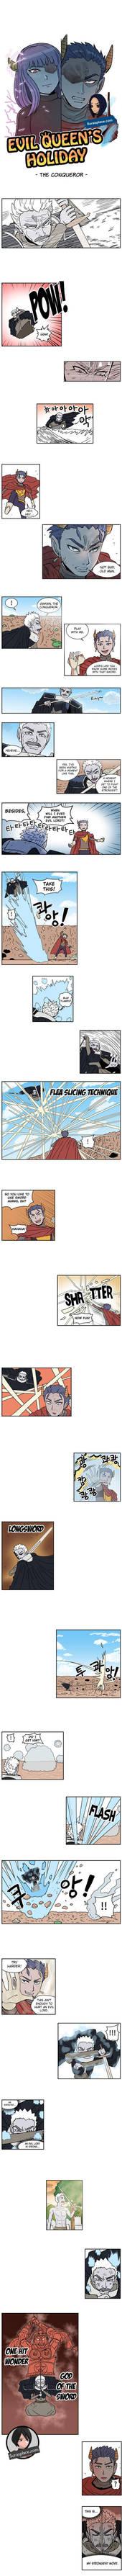 [Surasplace][Webtoon]Evil Queen-ep122 by sura-of-surasplace